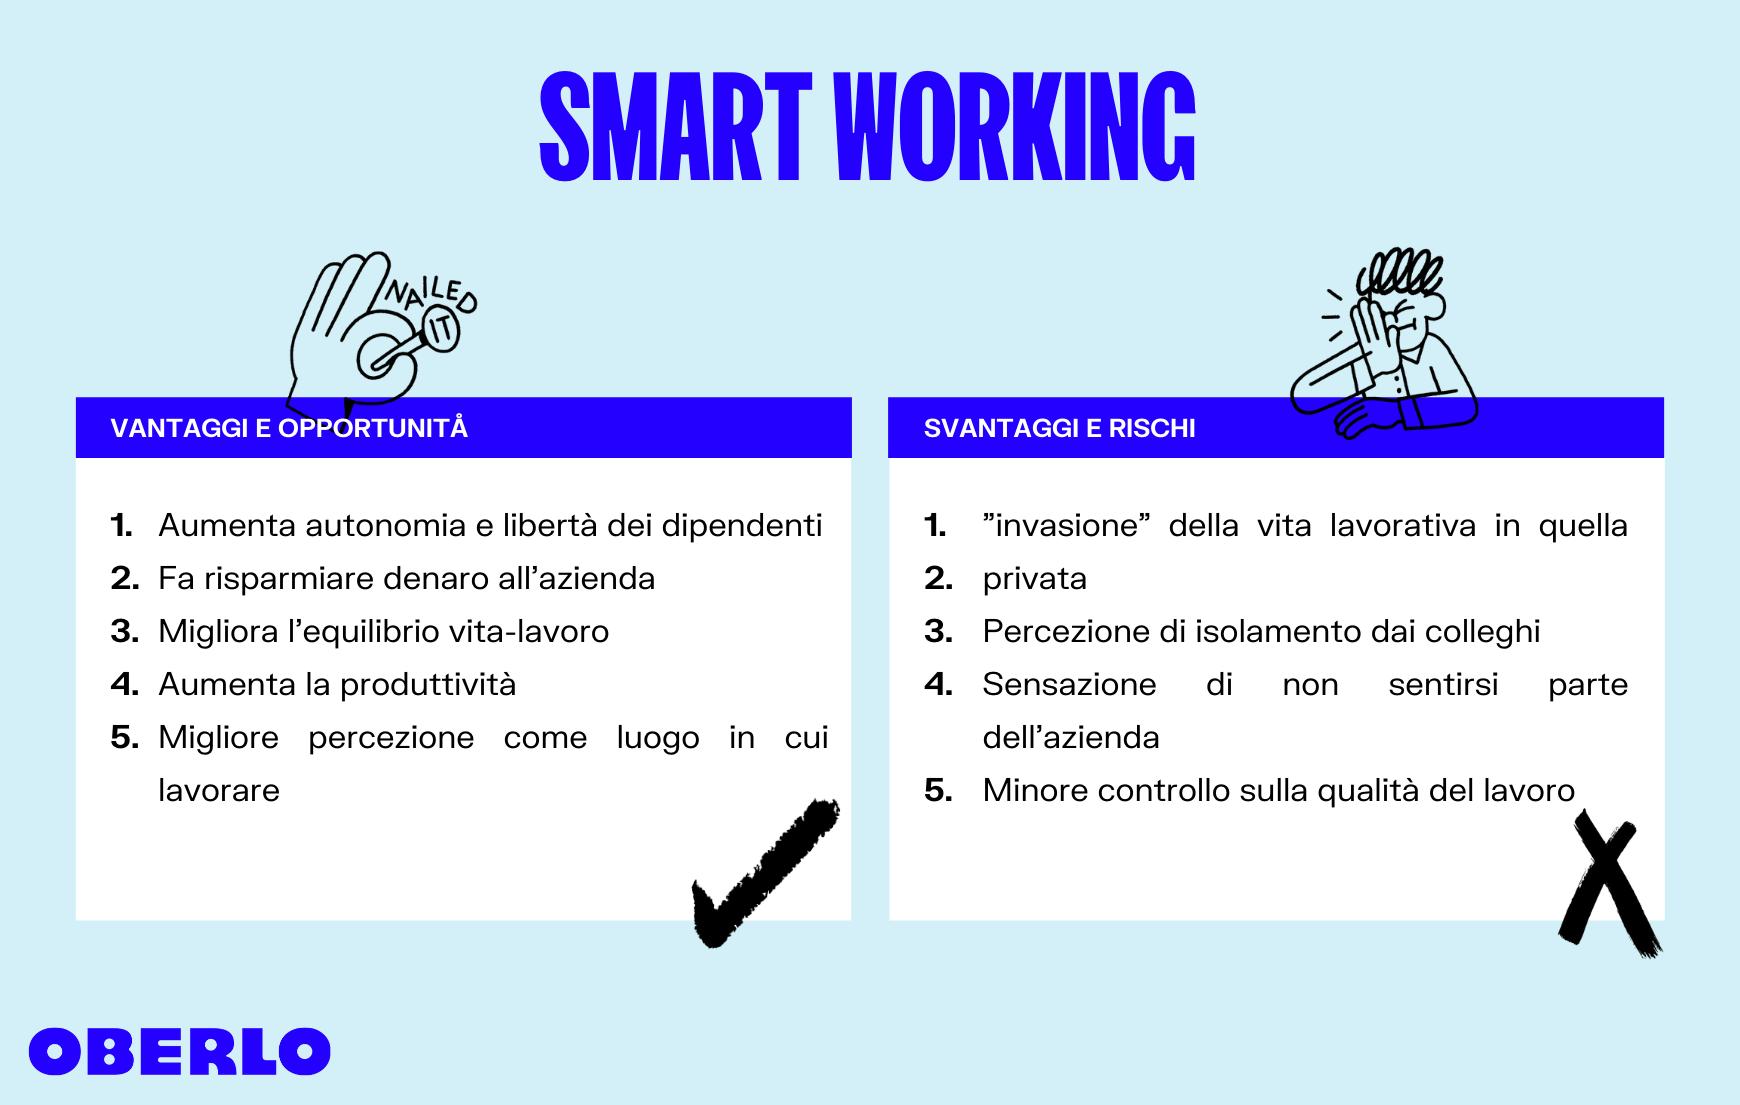 vantaggi e rischi smart working